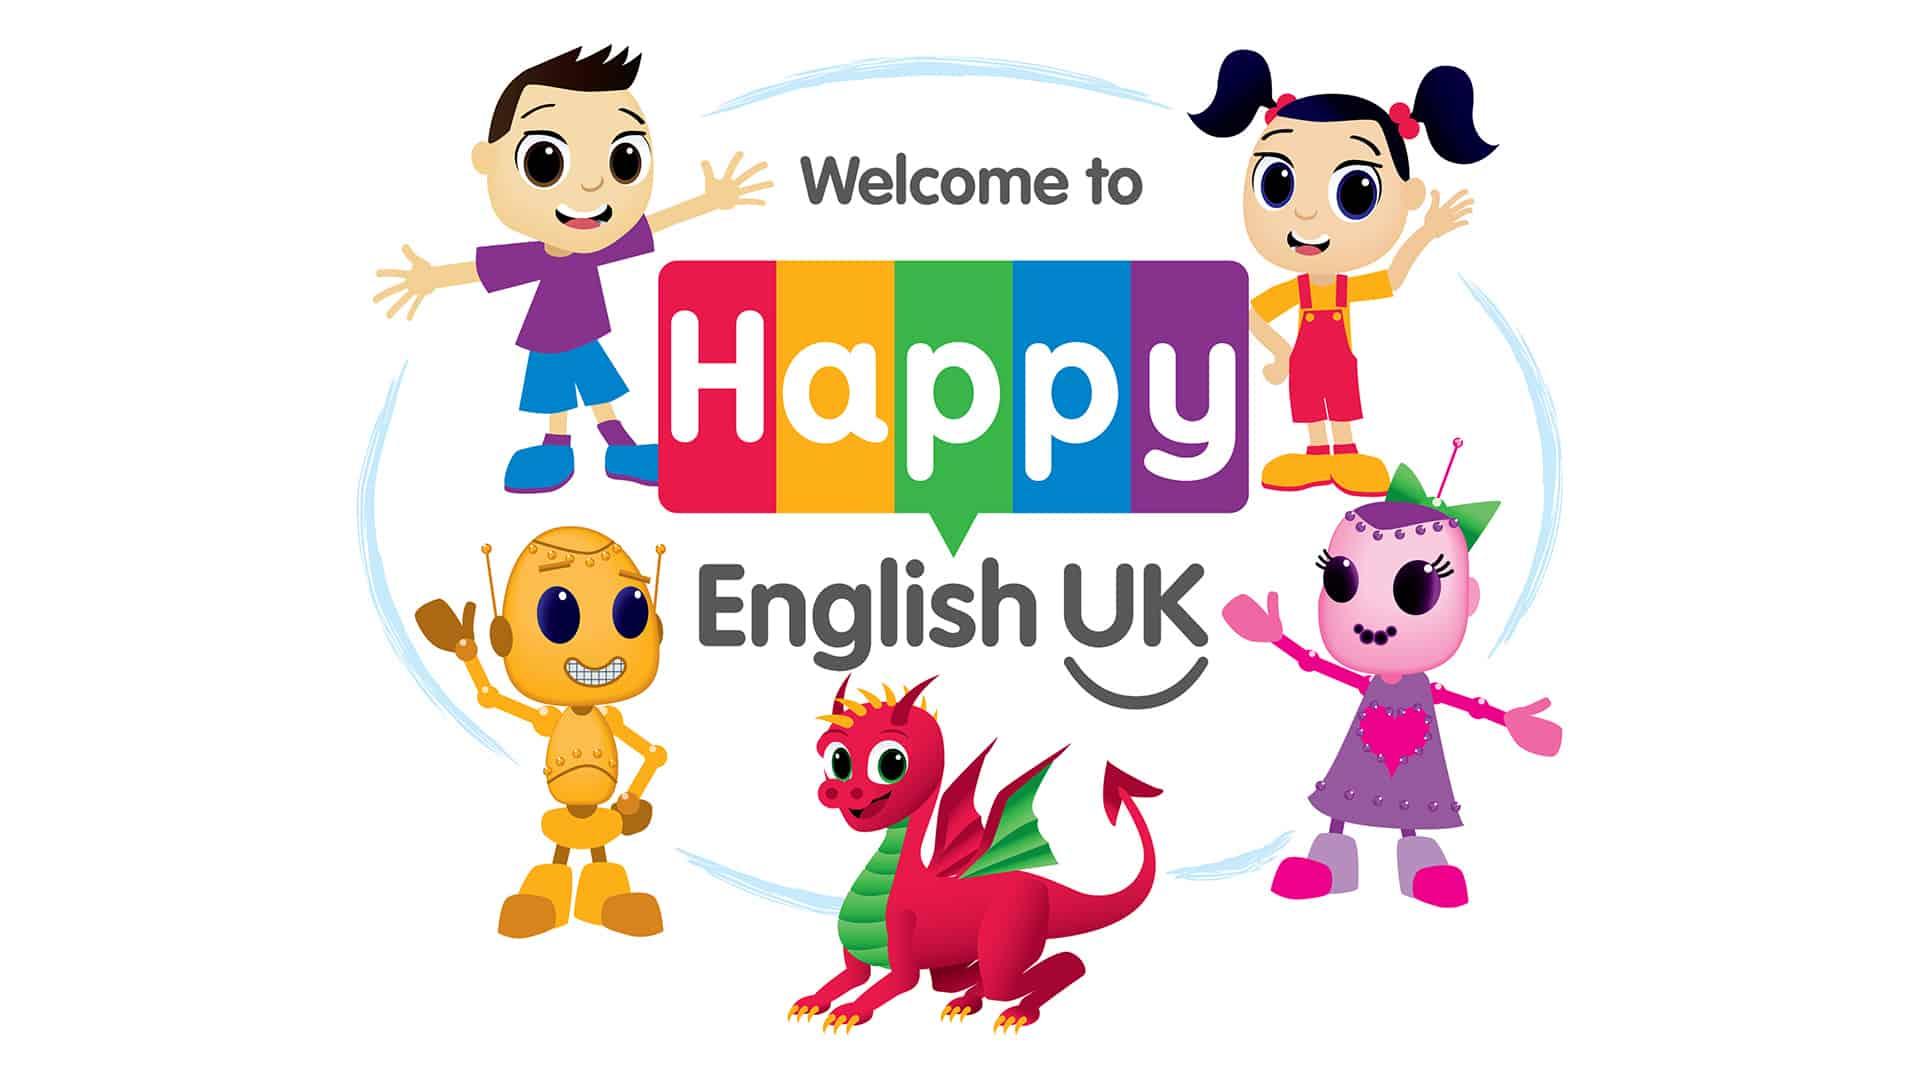 Happy English Image 2